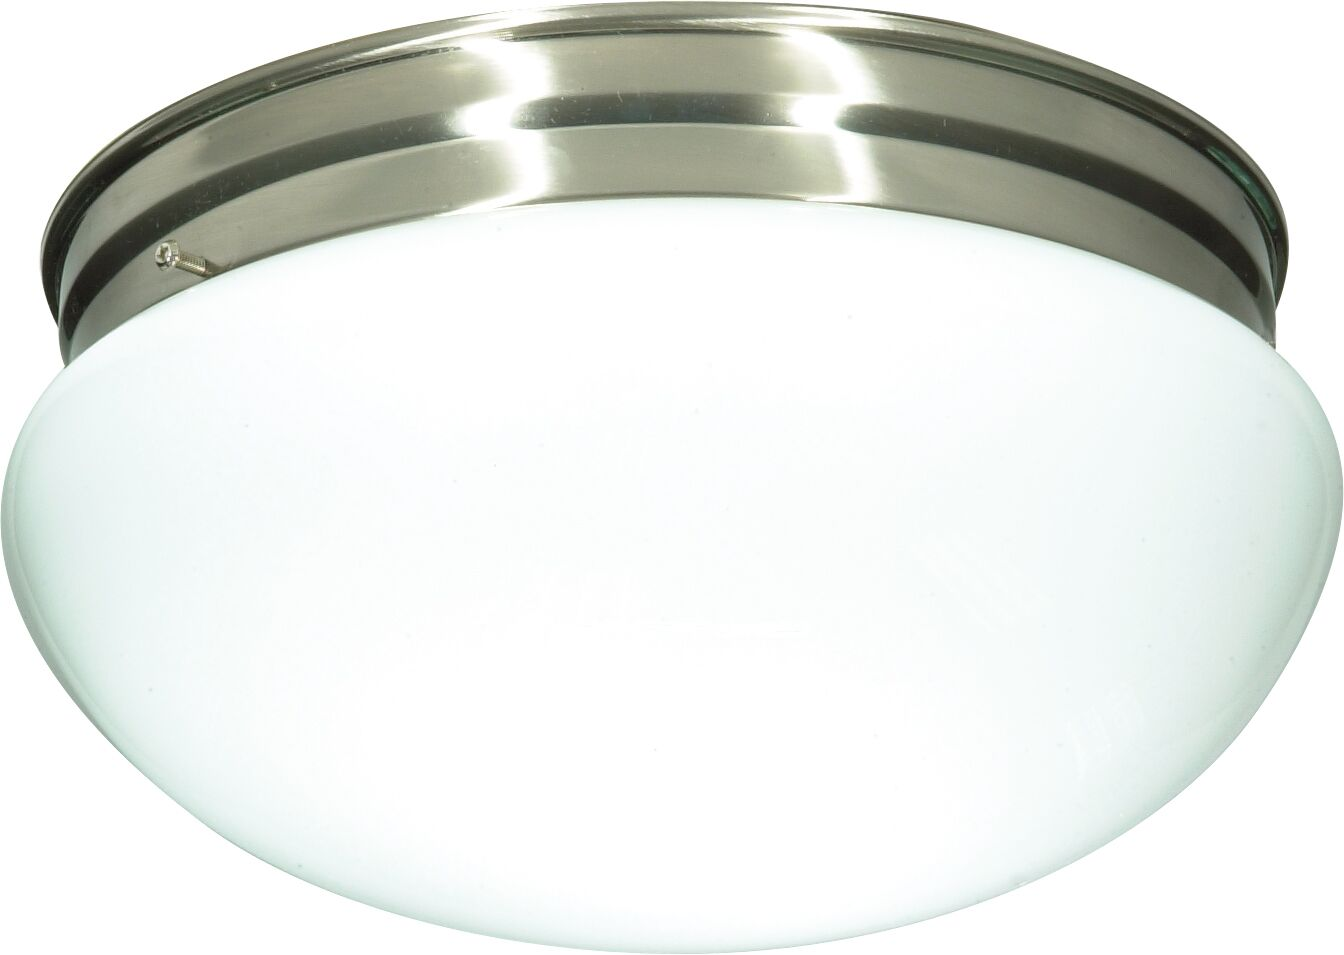 Chacon 2-Light Glass Shade Flush Mount Finish: Brushed Nickel